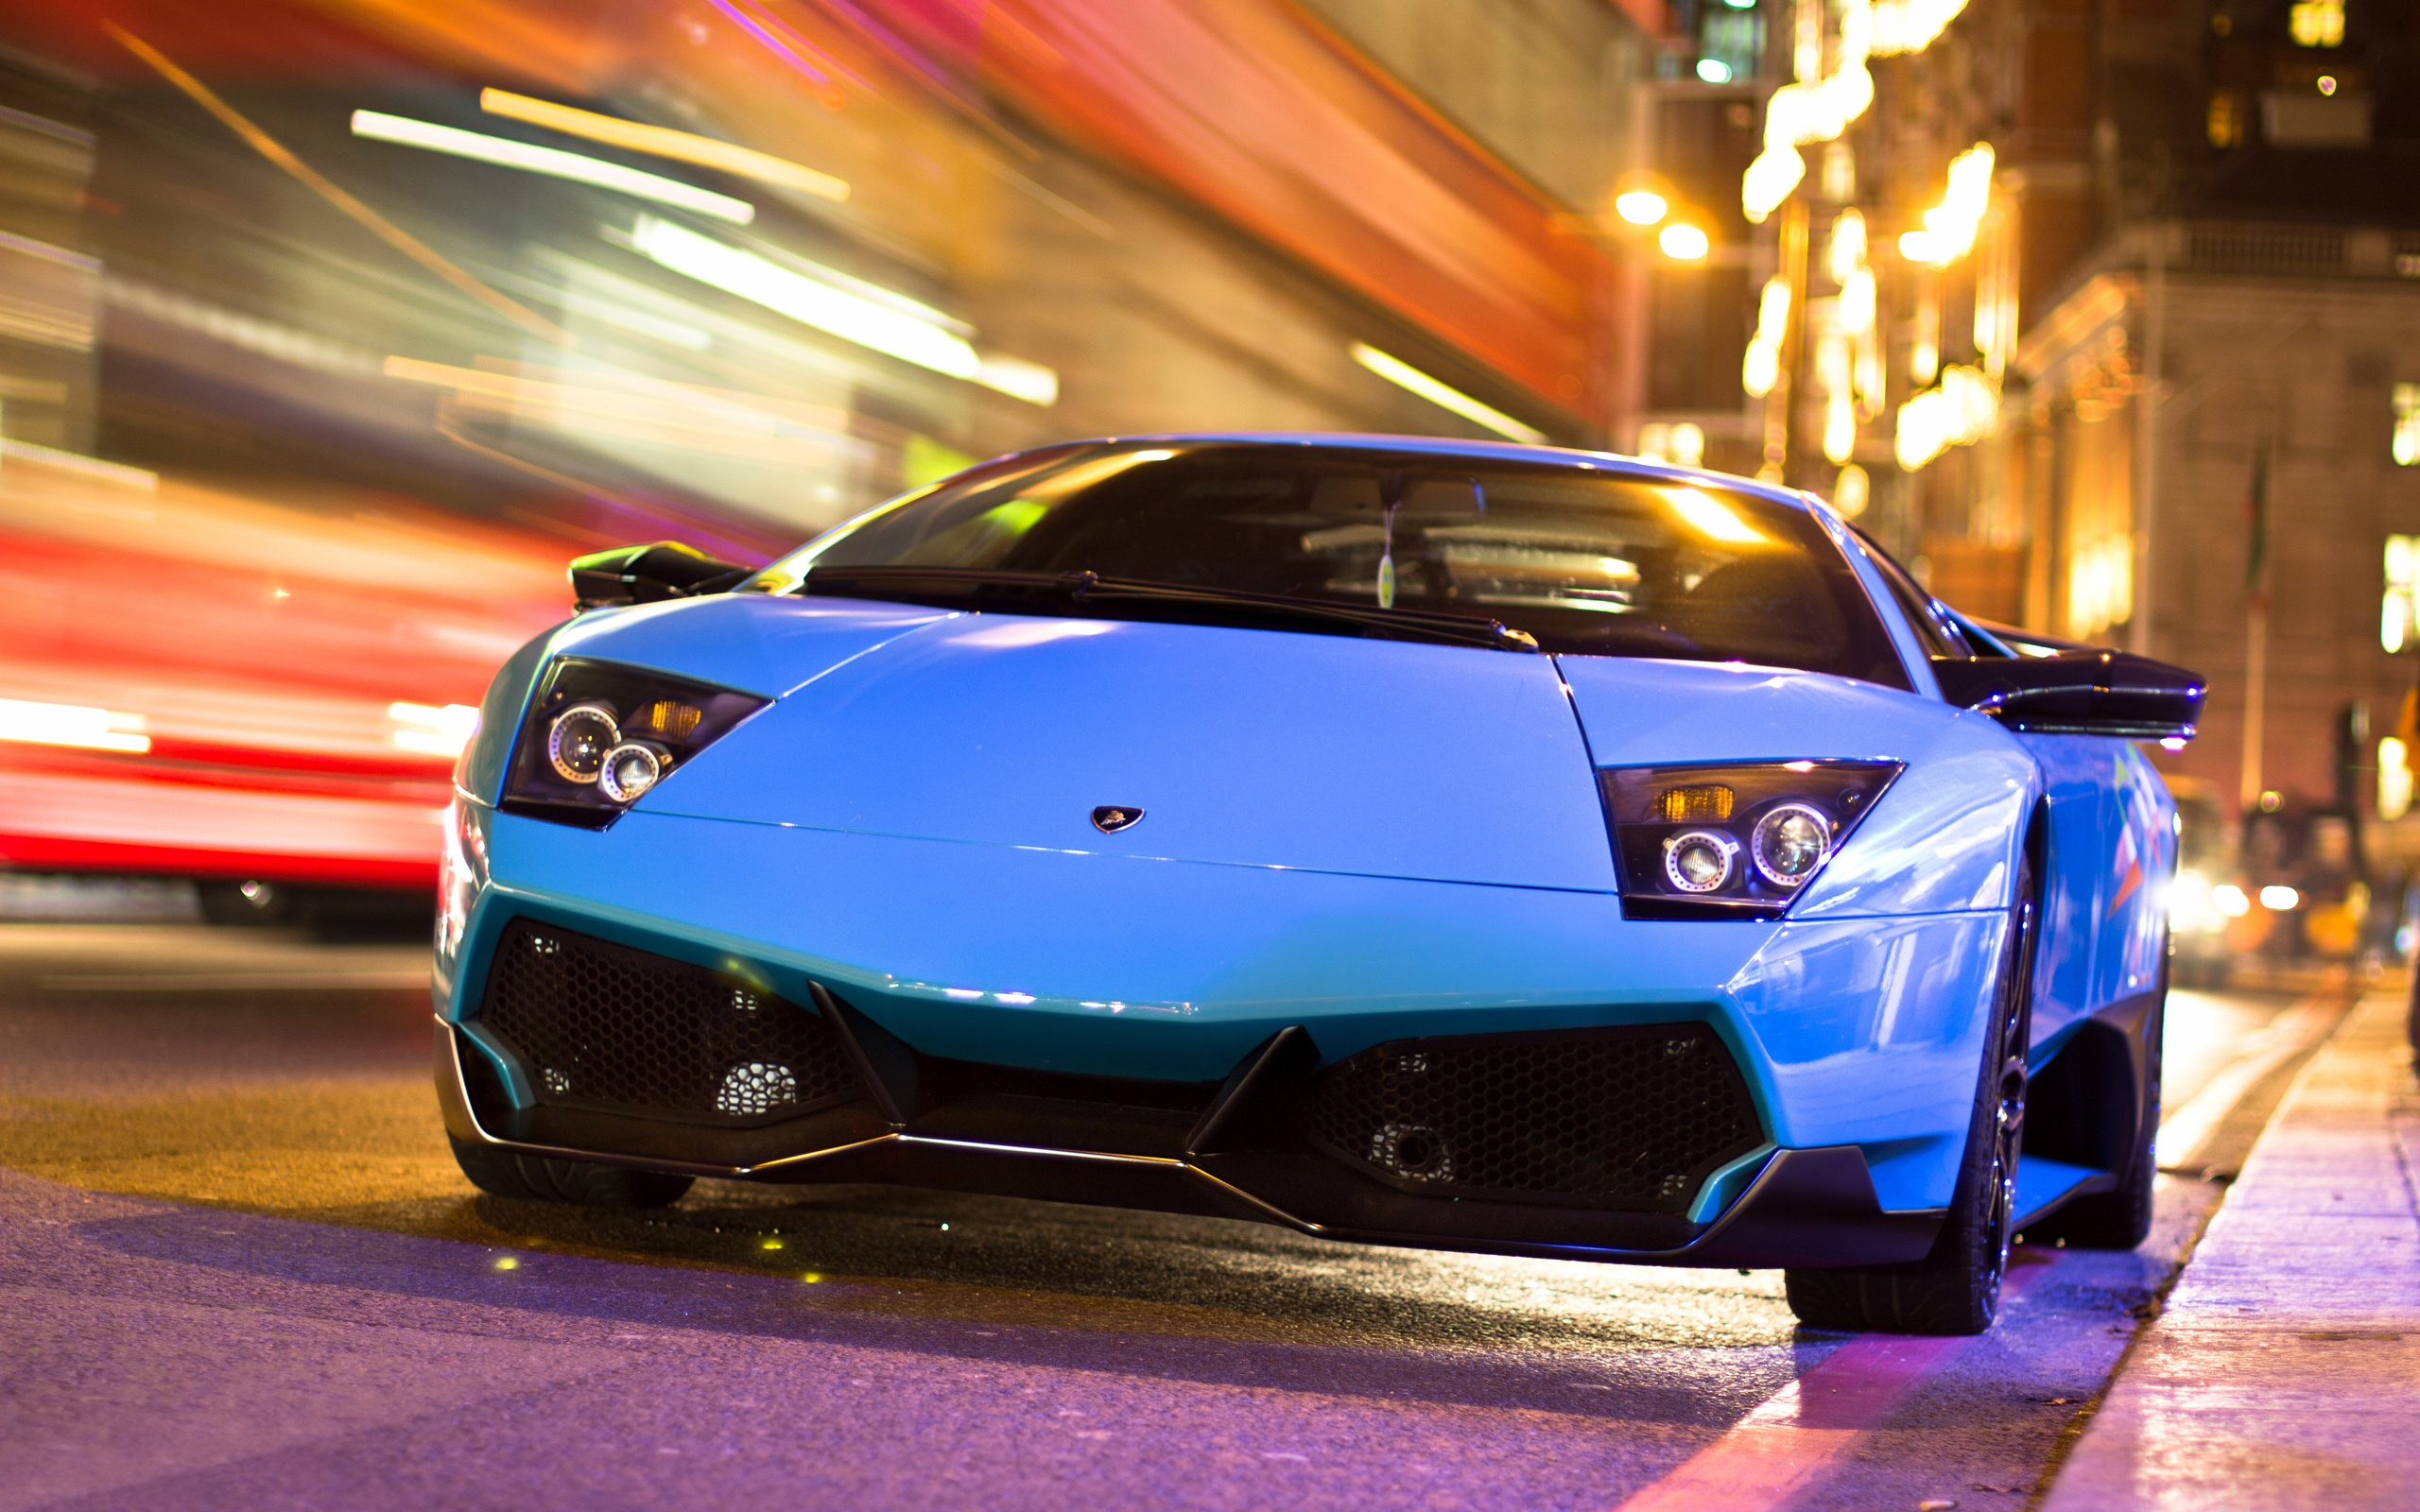 Wallpaper Lamborghini Blue Car In The City Night Road 2560x1600 Hd